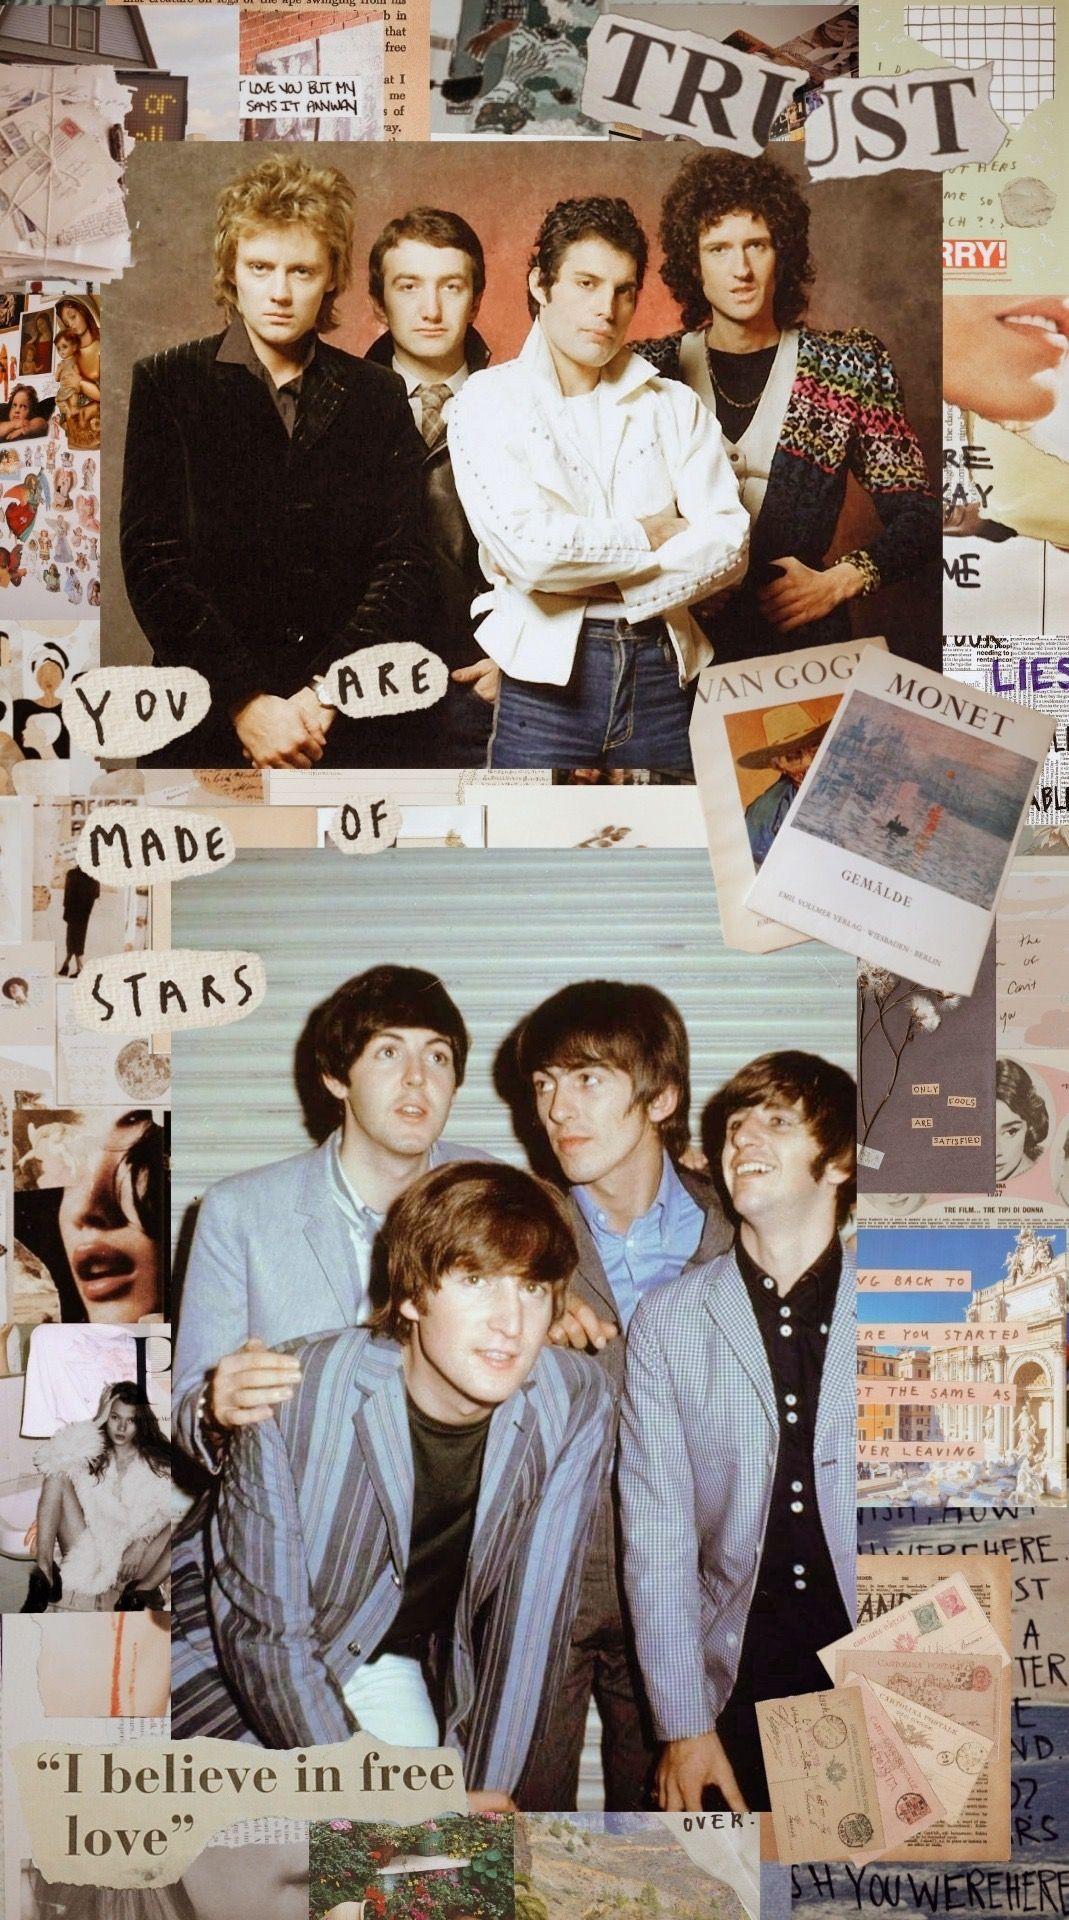 Pin by Bryn B Bergwall on The Beatles Beatles wallpaper